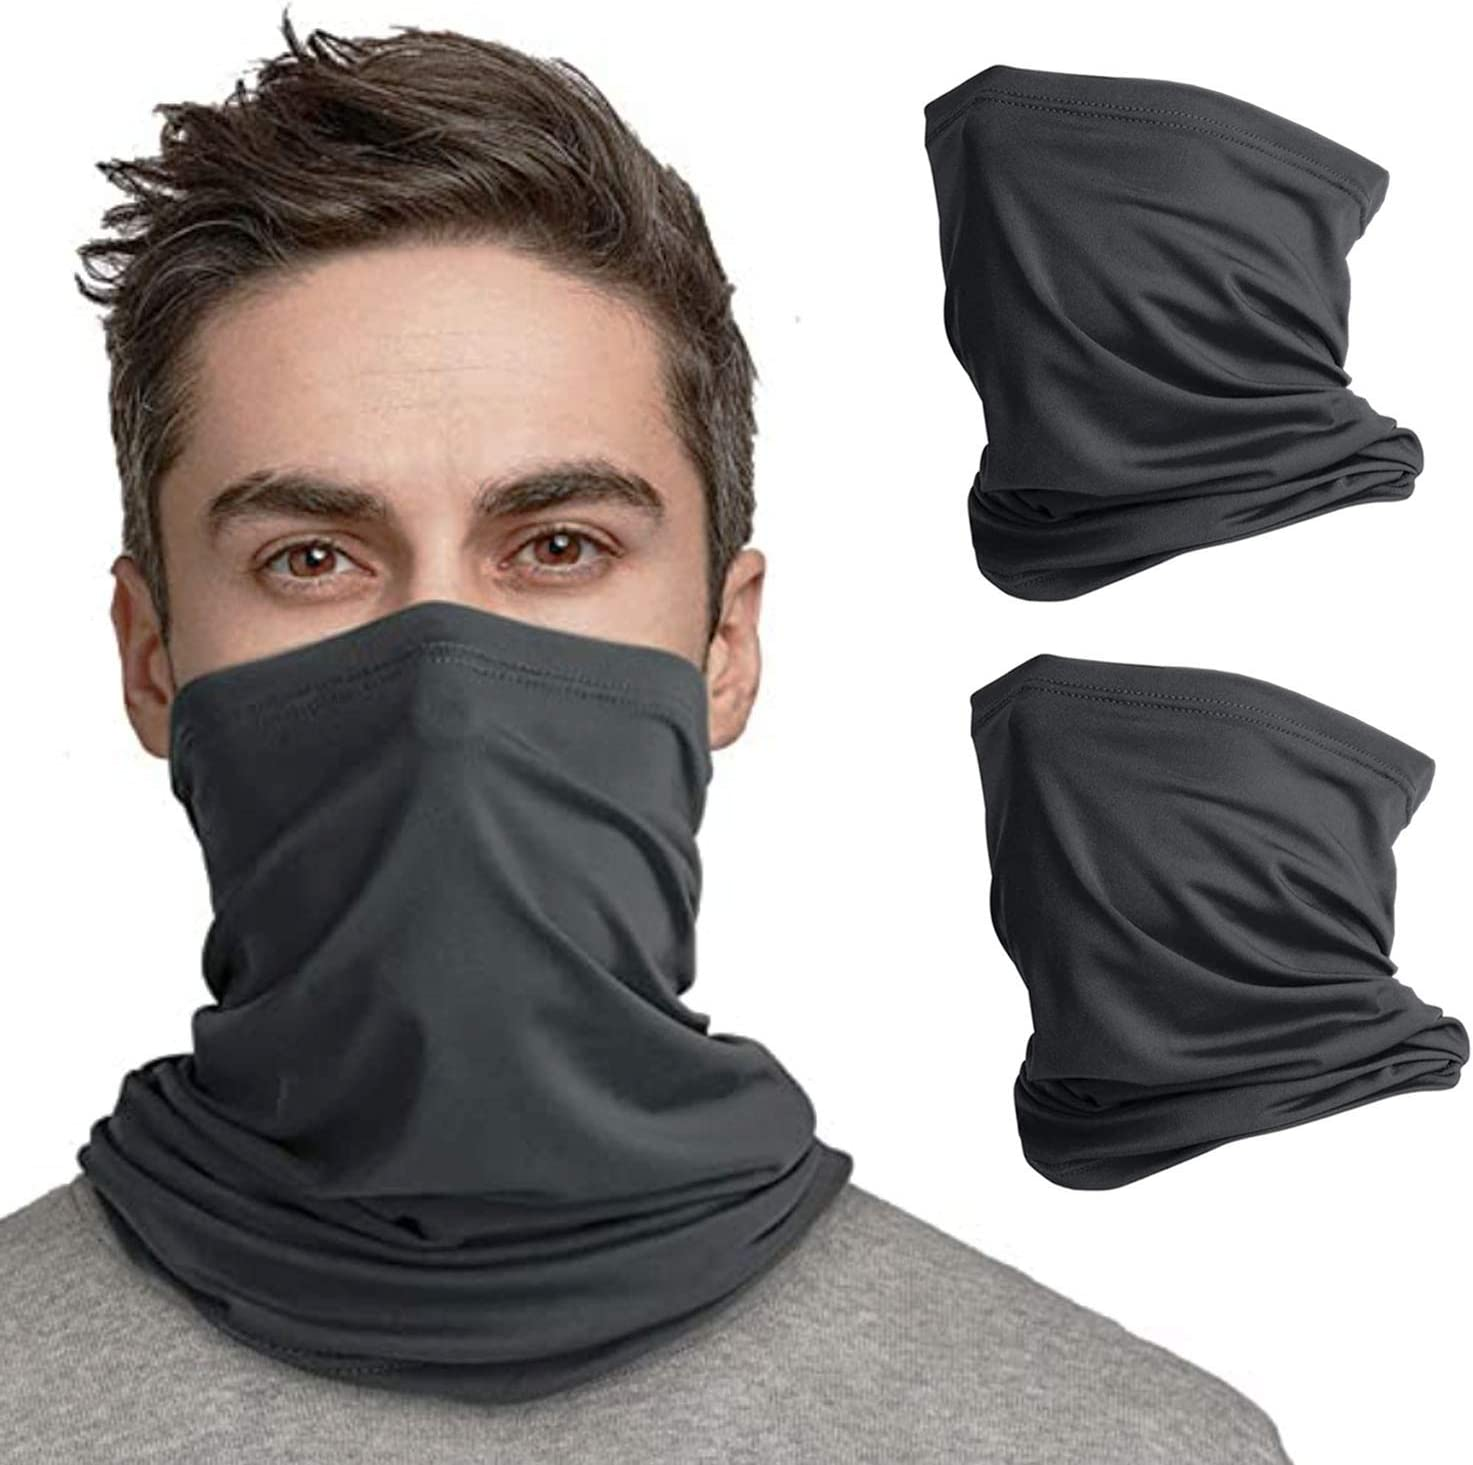 2pcs UNISEX Snood Face Covering women/'s Mask bandana Neck men Scarf Head Band UK